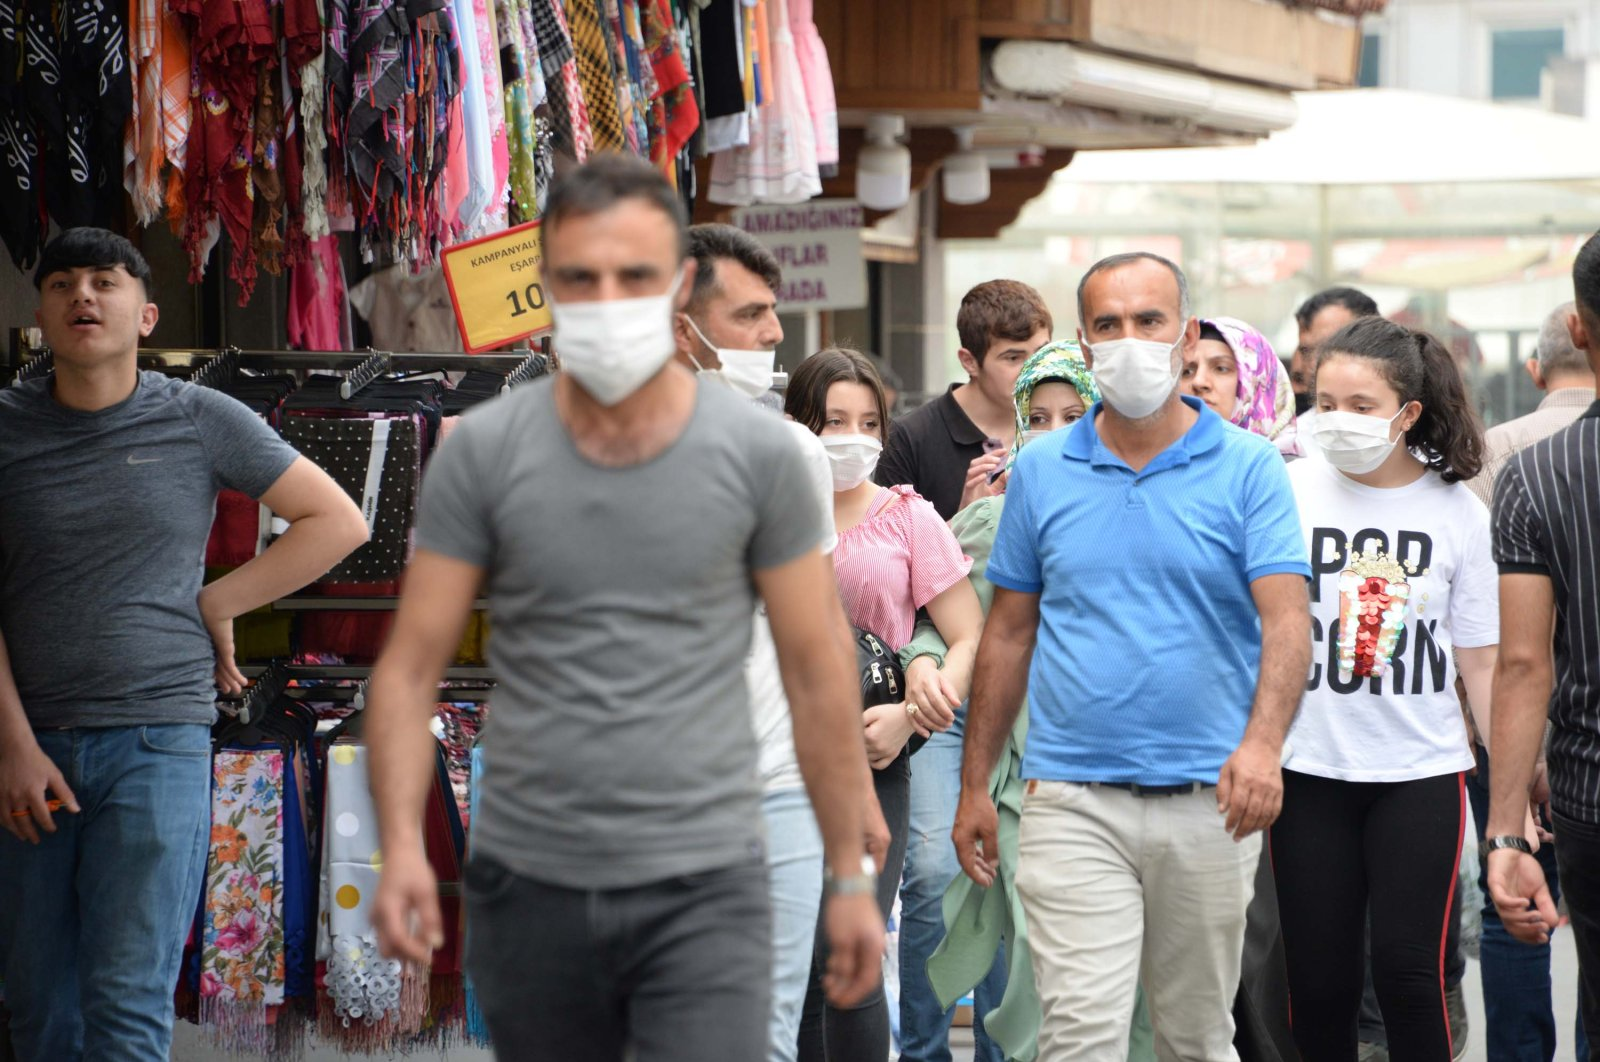 People wearing masks walk on the street in Diyarbakır, Turkey, June 9, 2020. (DHA Photo)